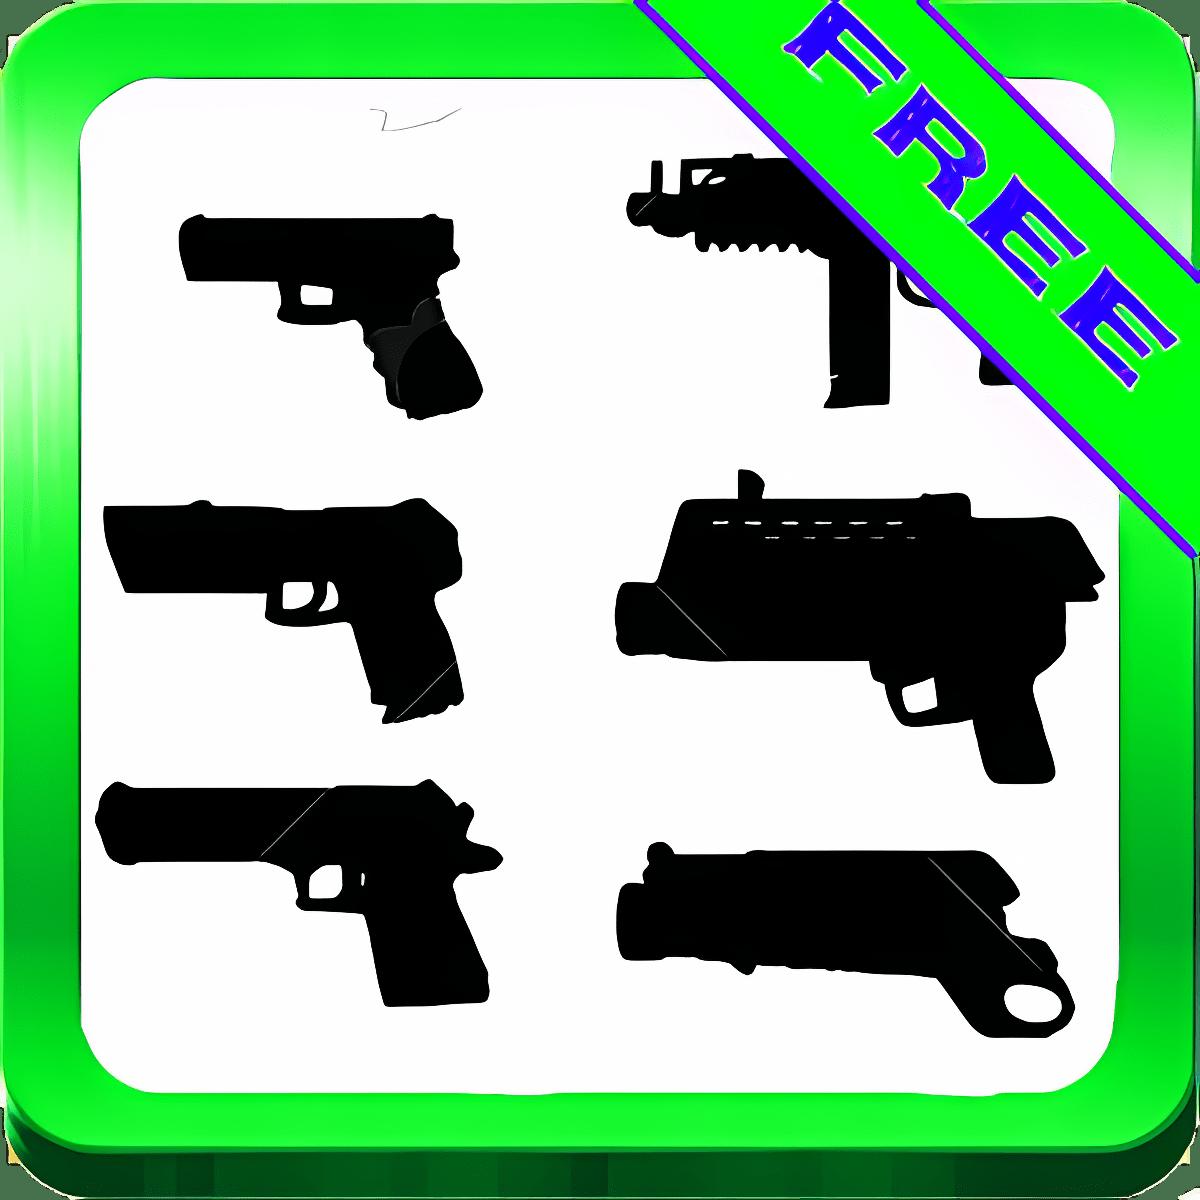 Pistolas Rifles Machineguns So